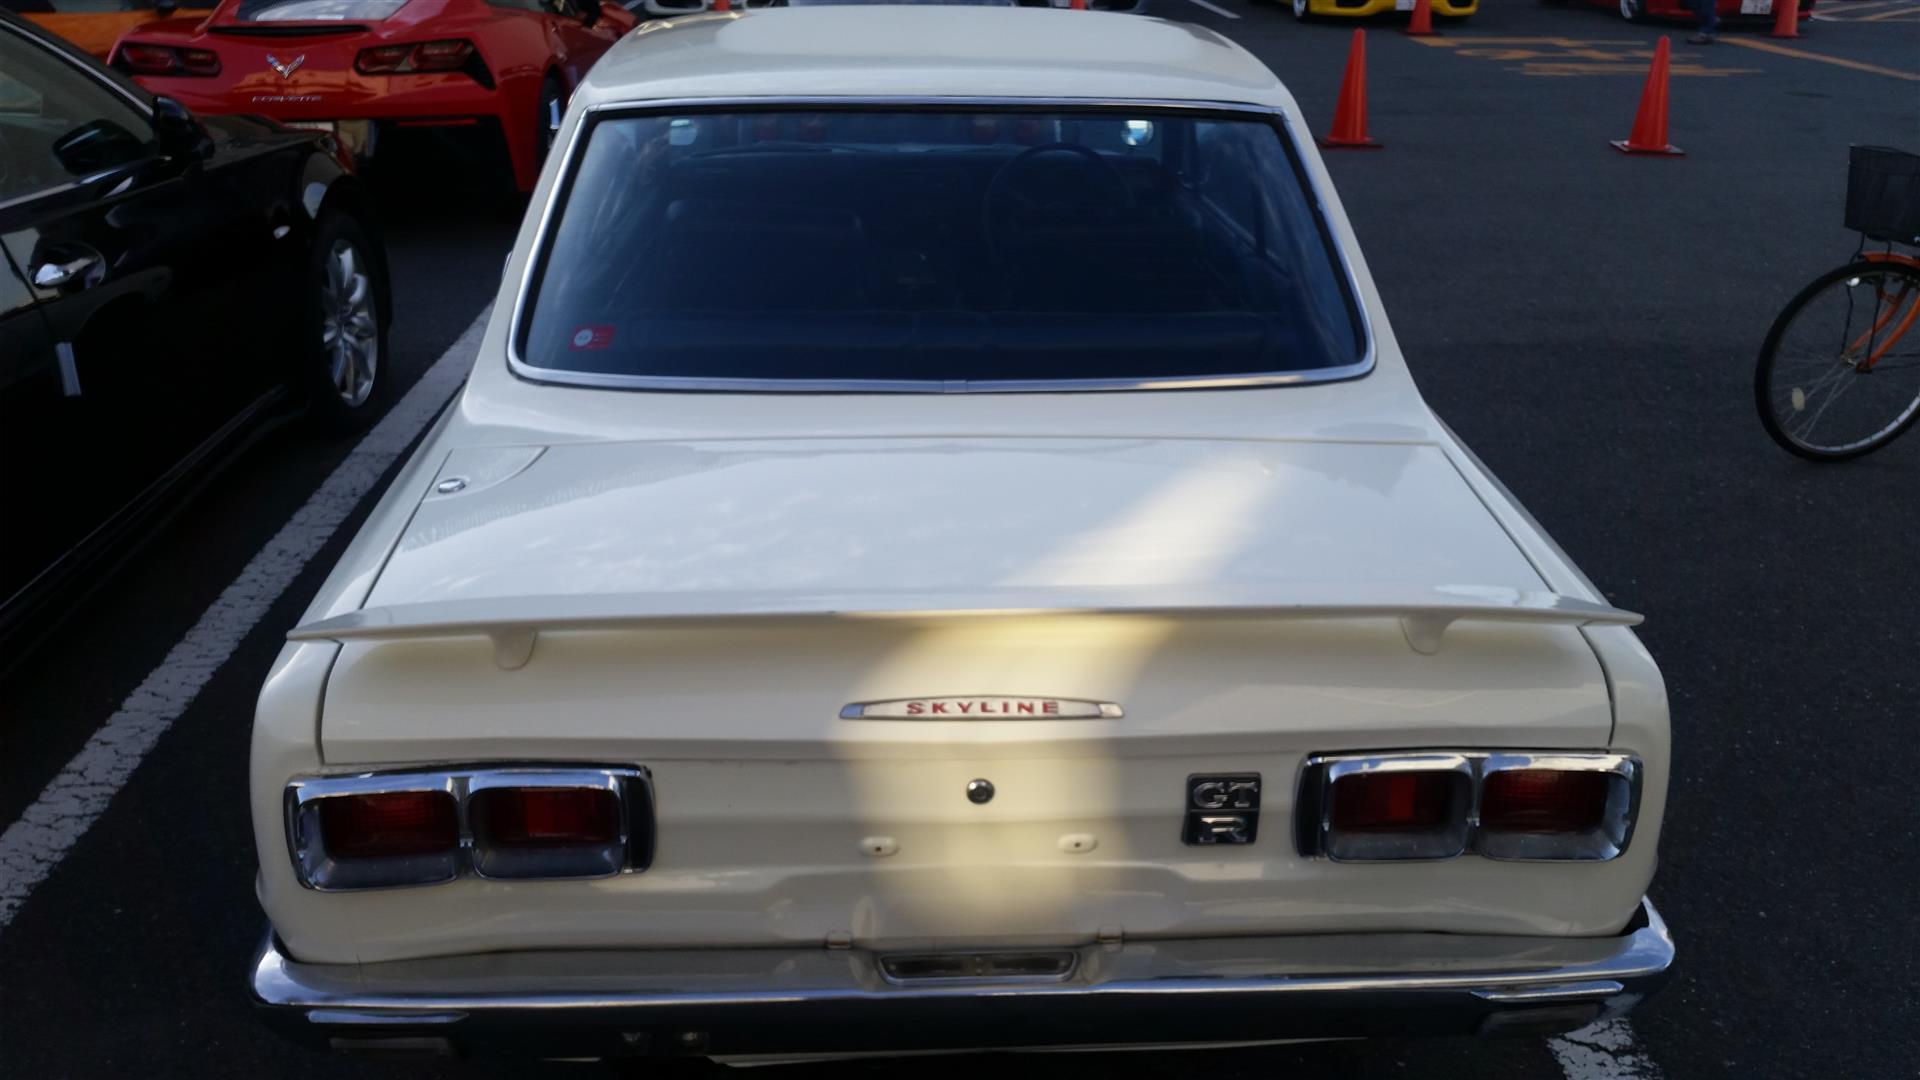 Nissan Skyline KGC10 9